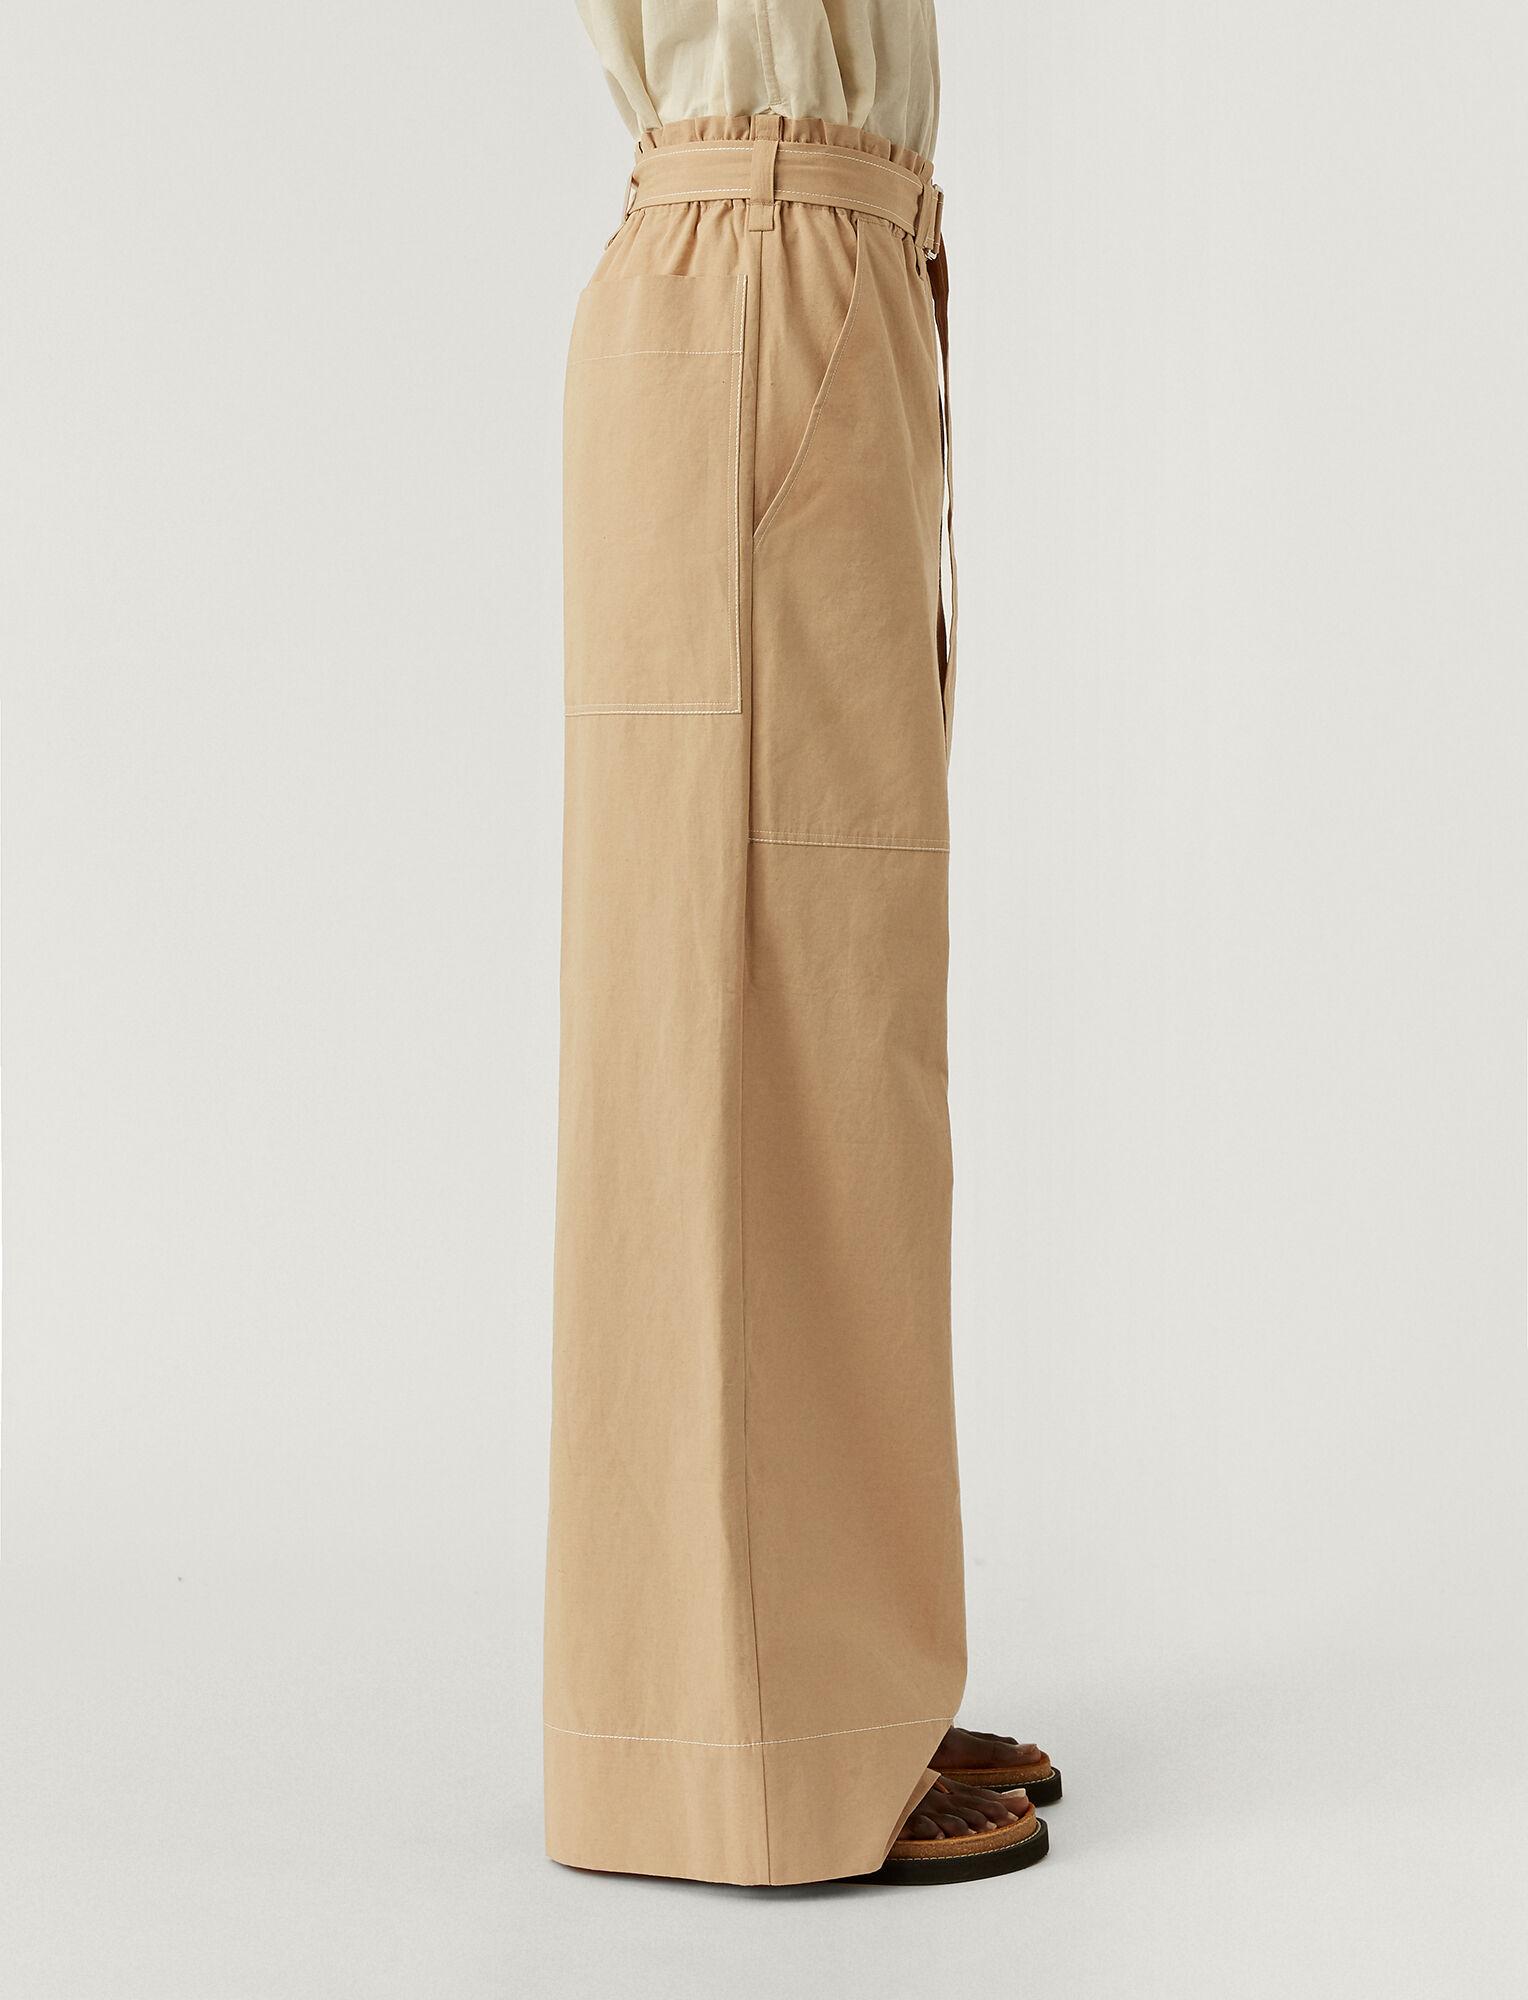 Joseph, Cotton Linen Taika Trousers, in LINEN